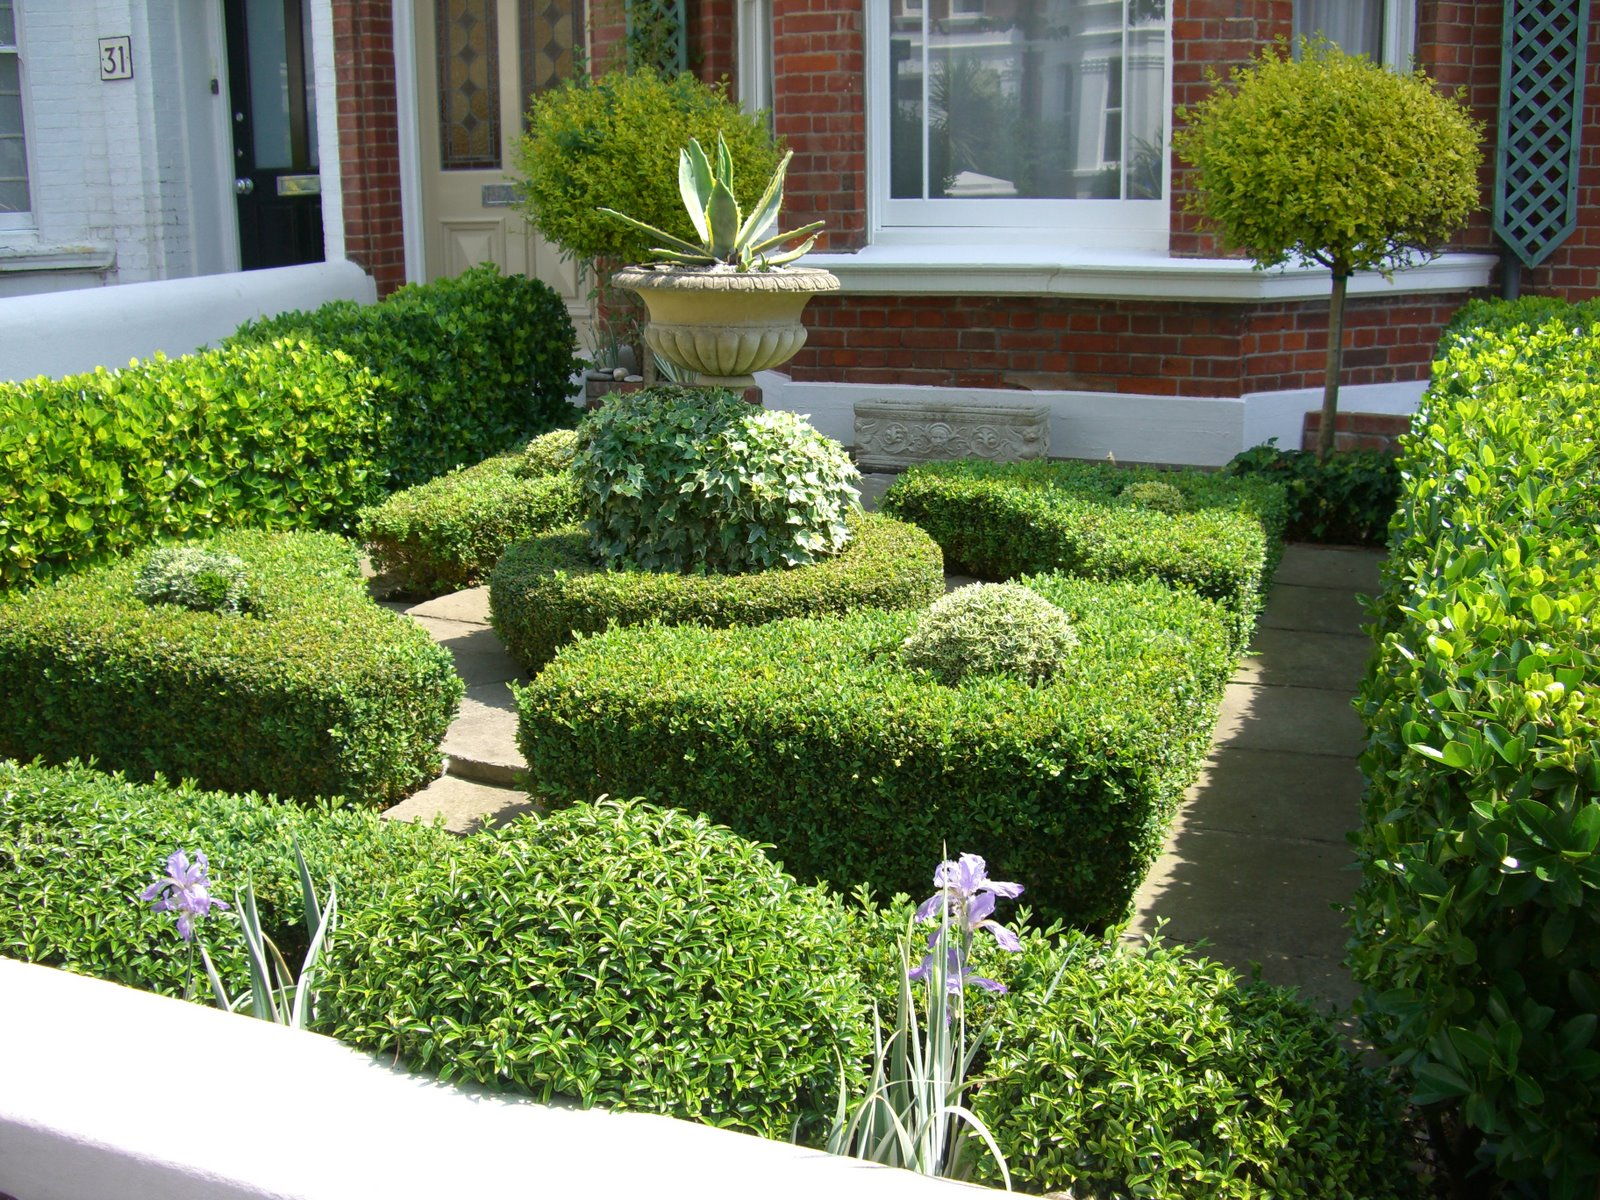 Garden Home Landscape Ideas - HomesFeed